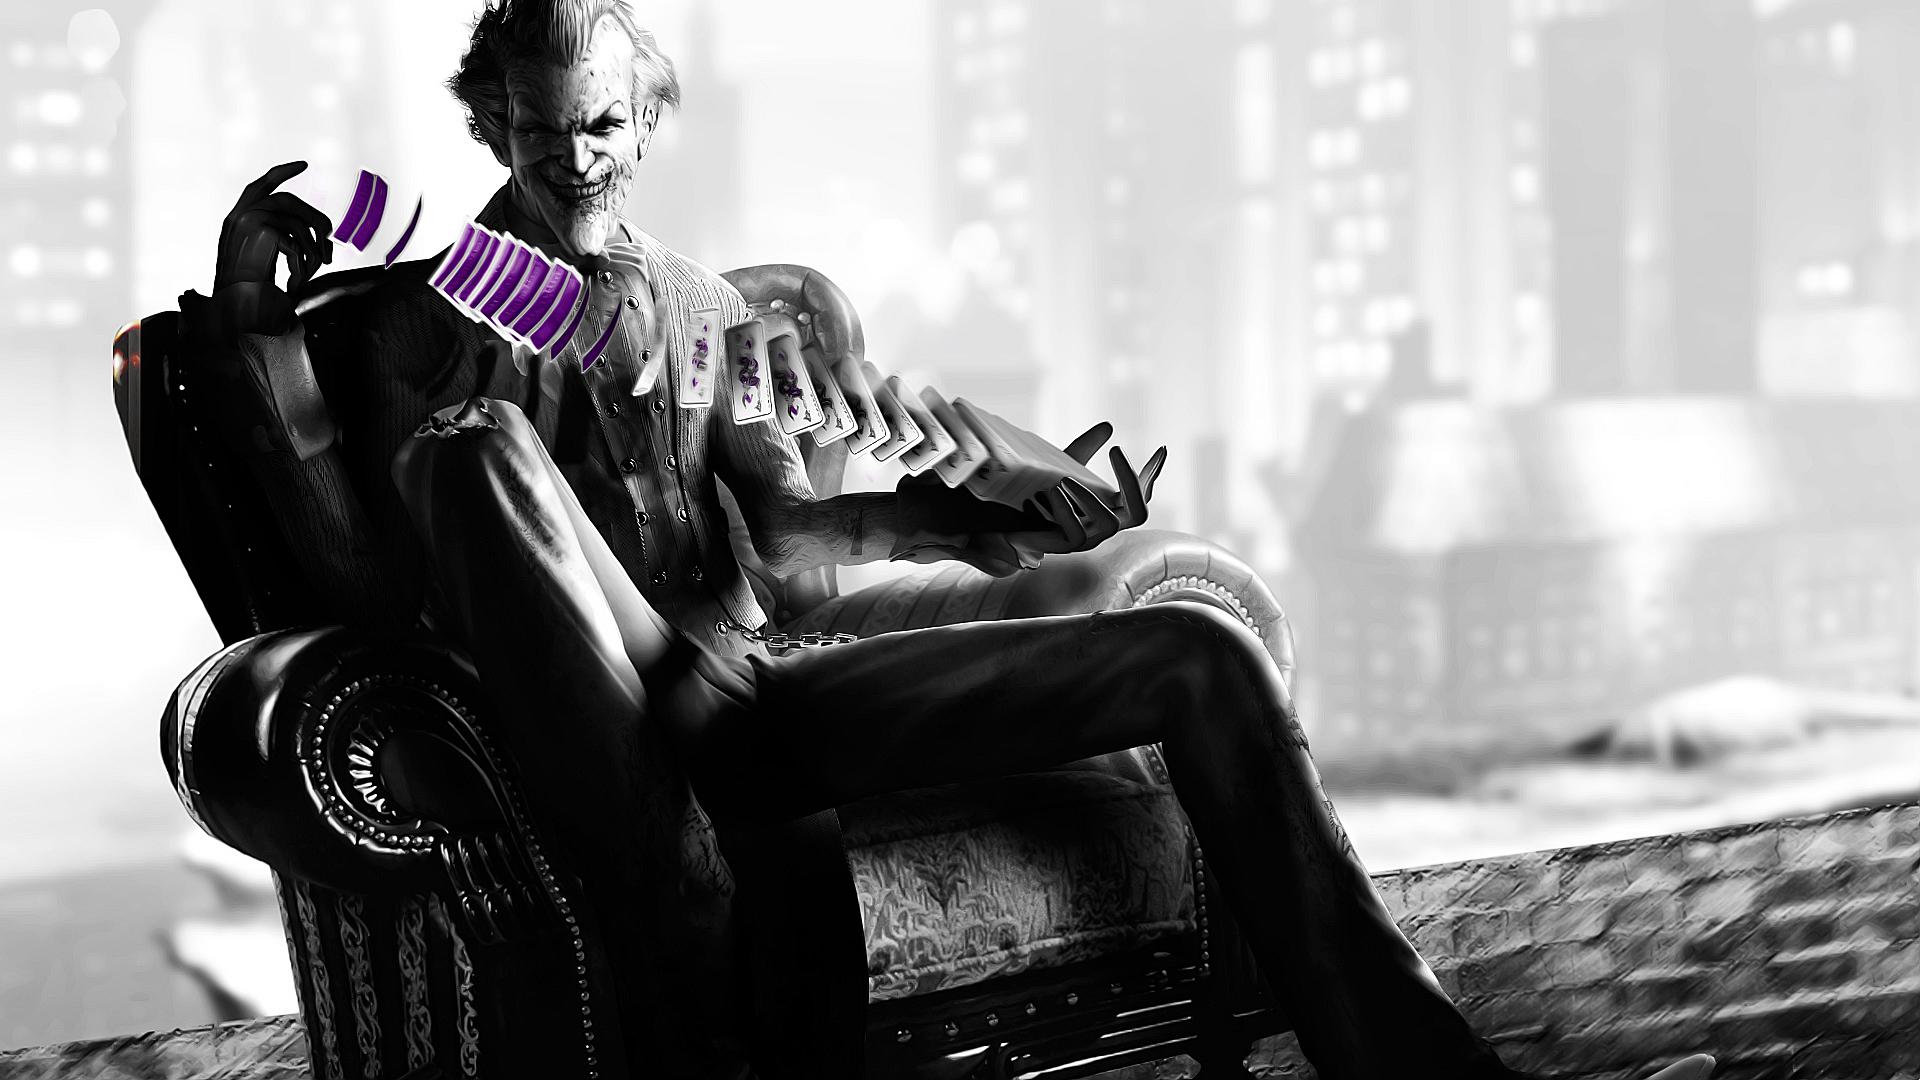 190 Batman Arkham City Hd Wallpapers Backgrounds